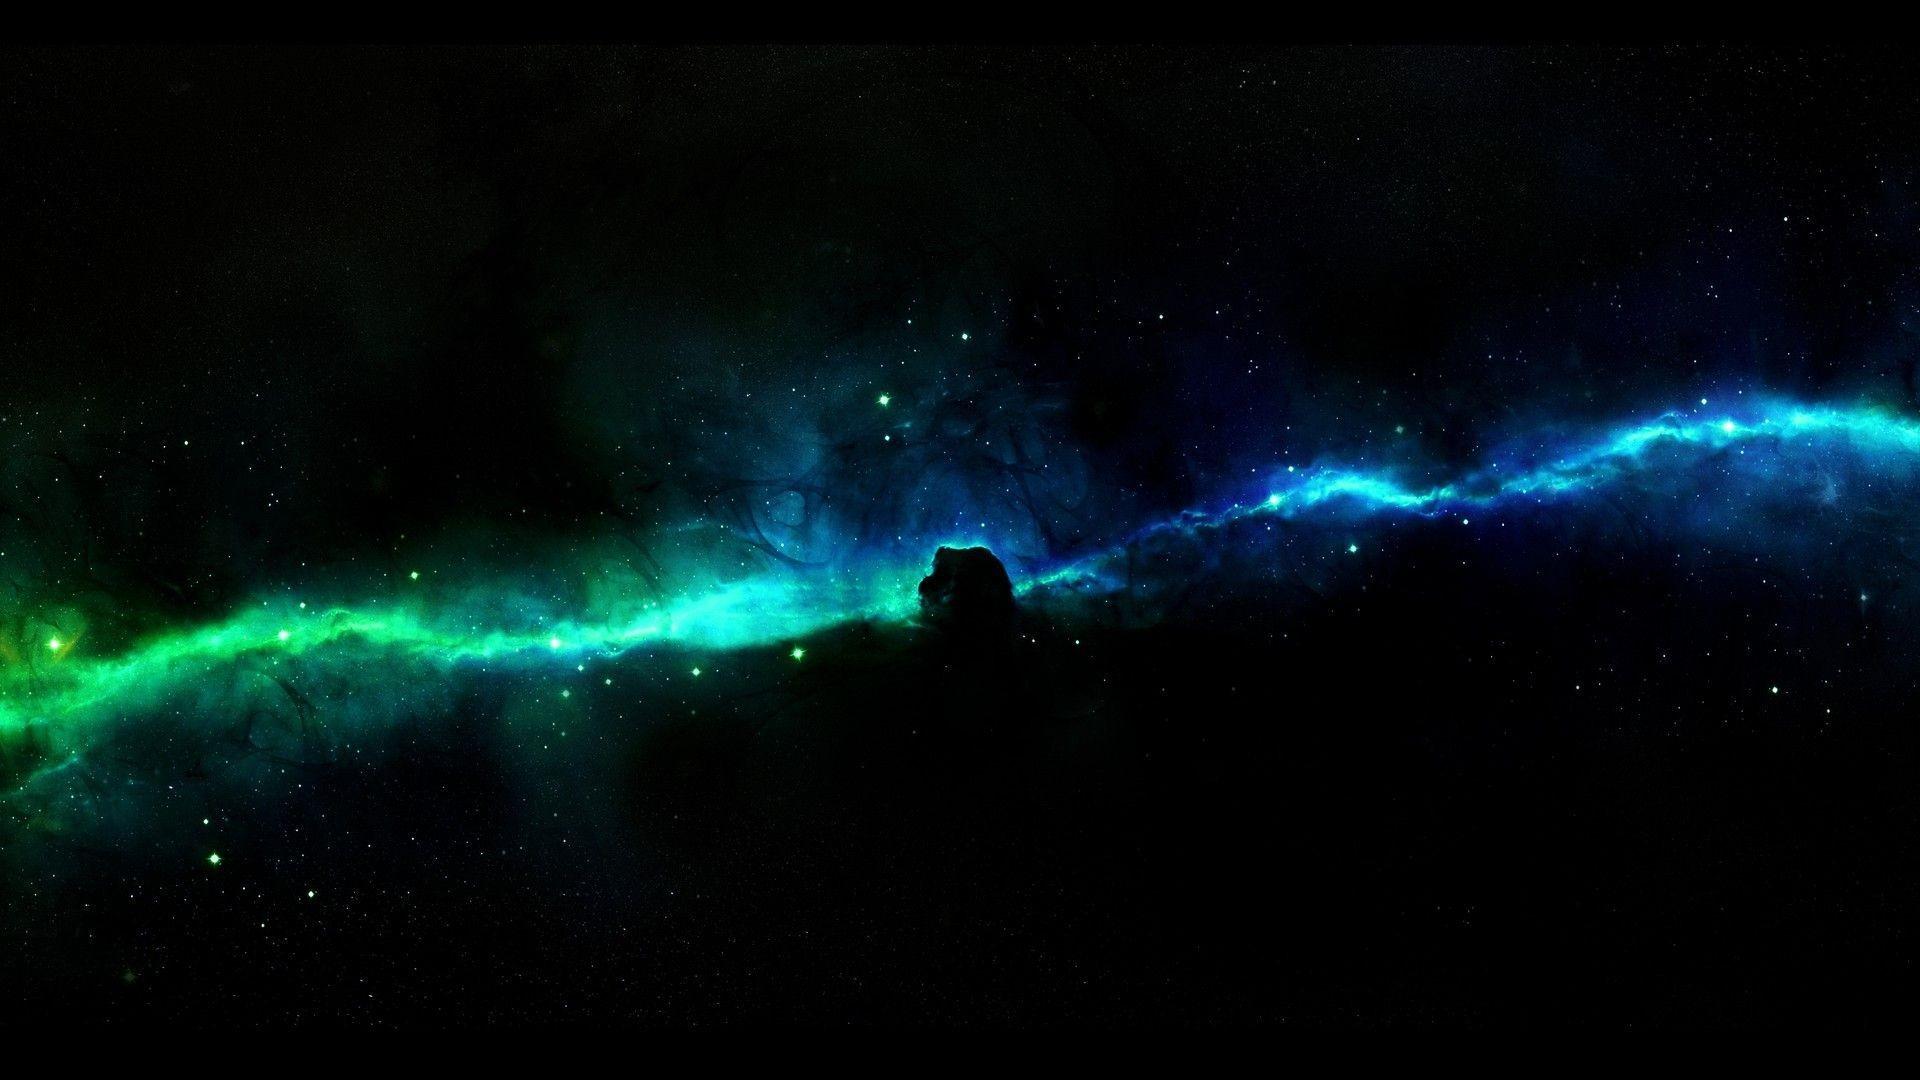 Nebula Desktop Backgrounds Hd Desktop 10 Hd Wallpapers